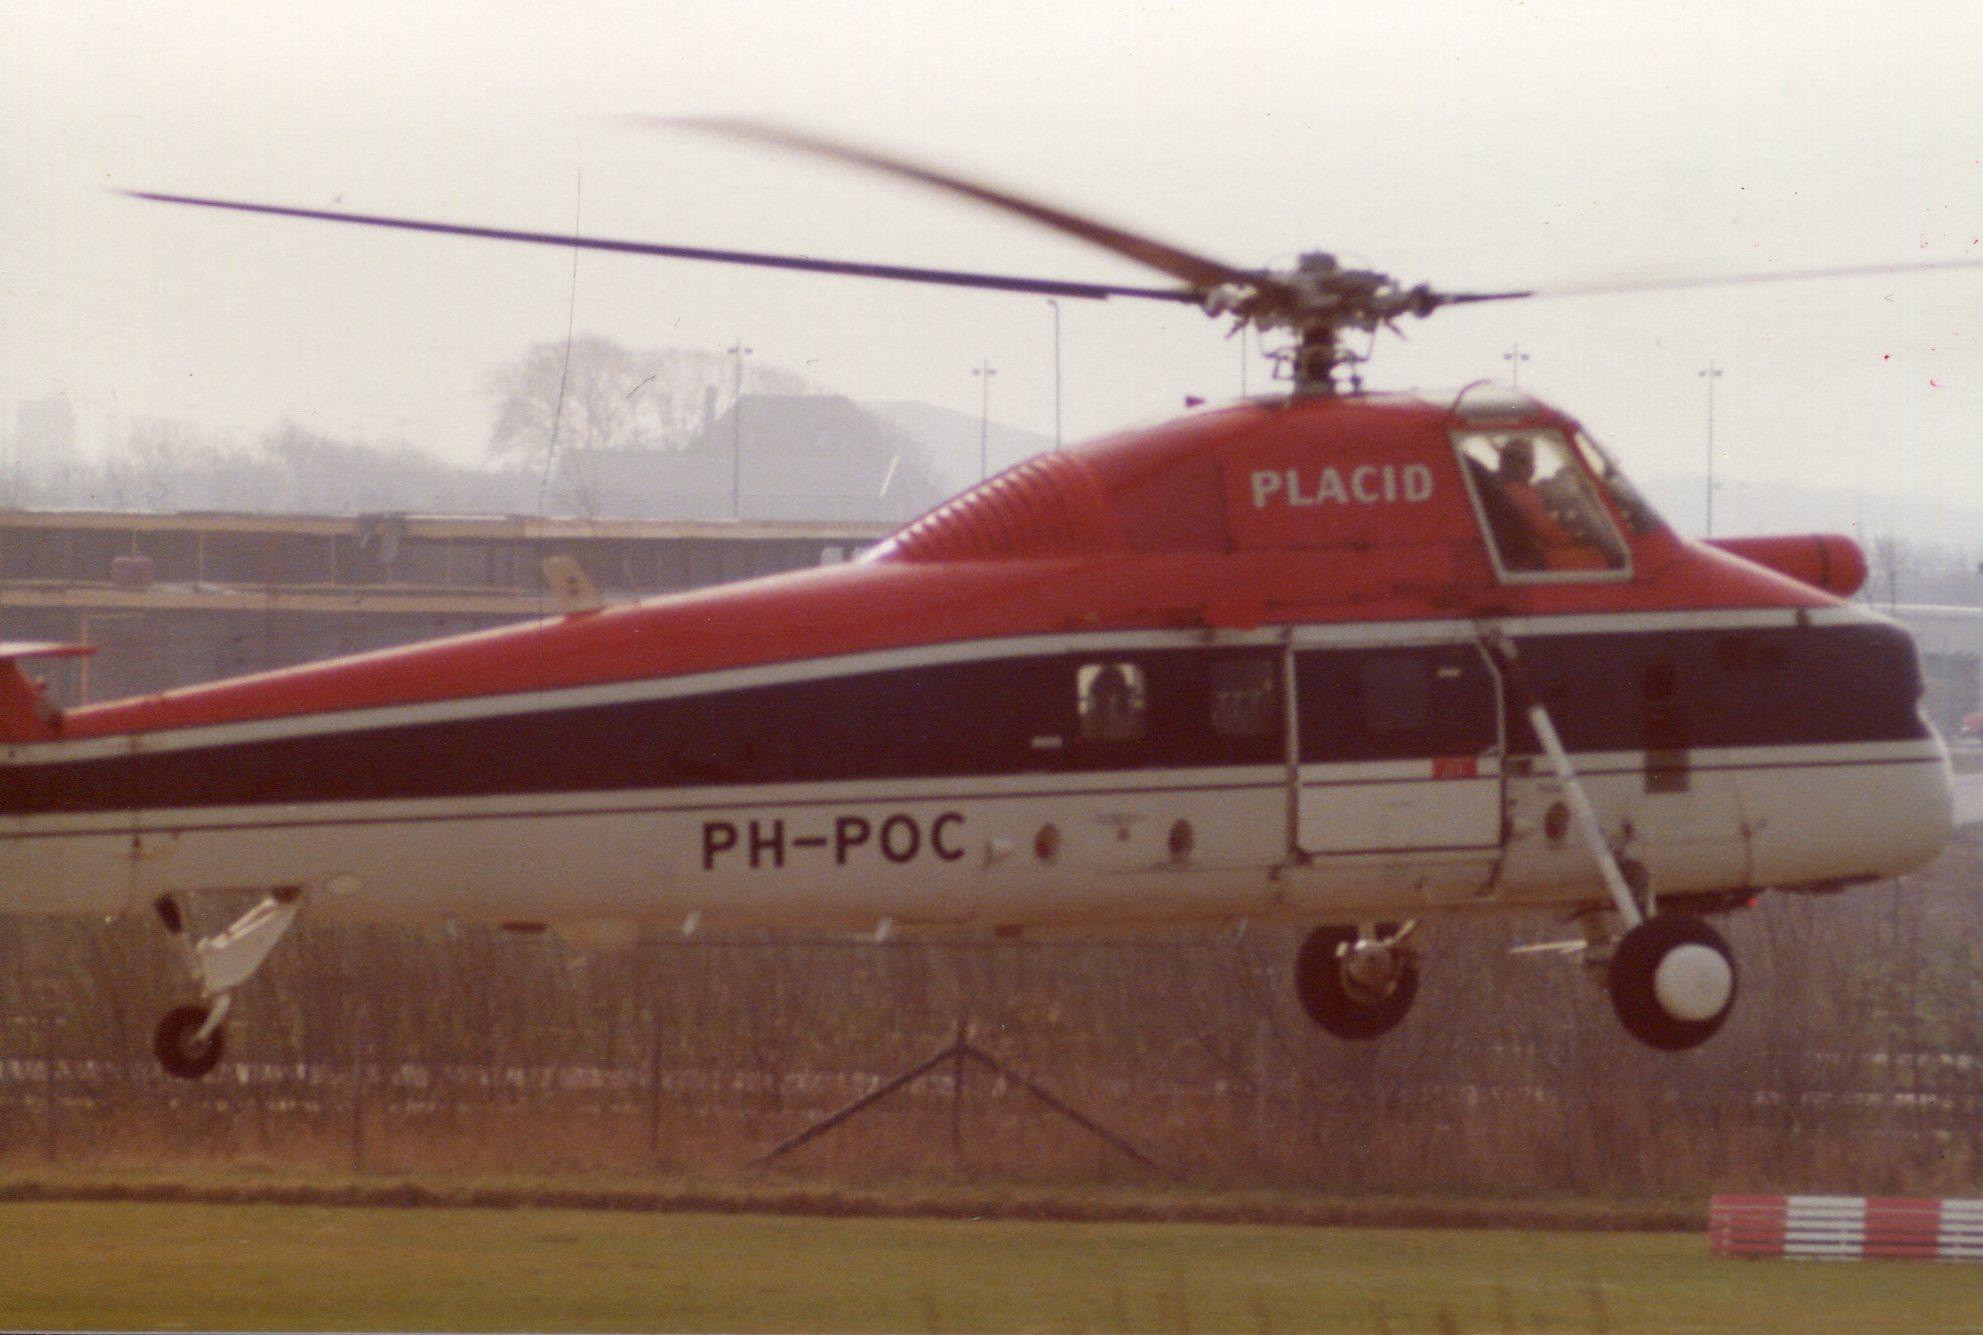 Naam: Den Helder , april 1977.jpg Bekeken: 566 Grootte: 279,4 KB